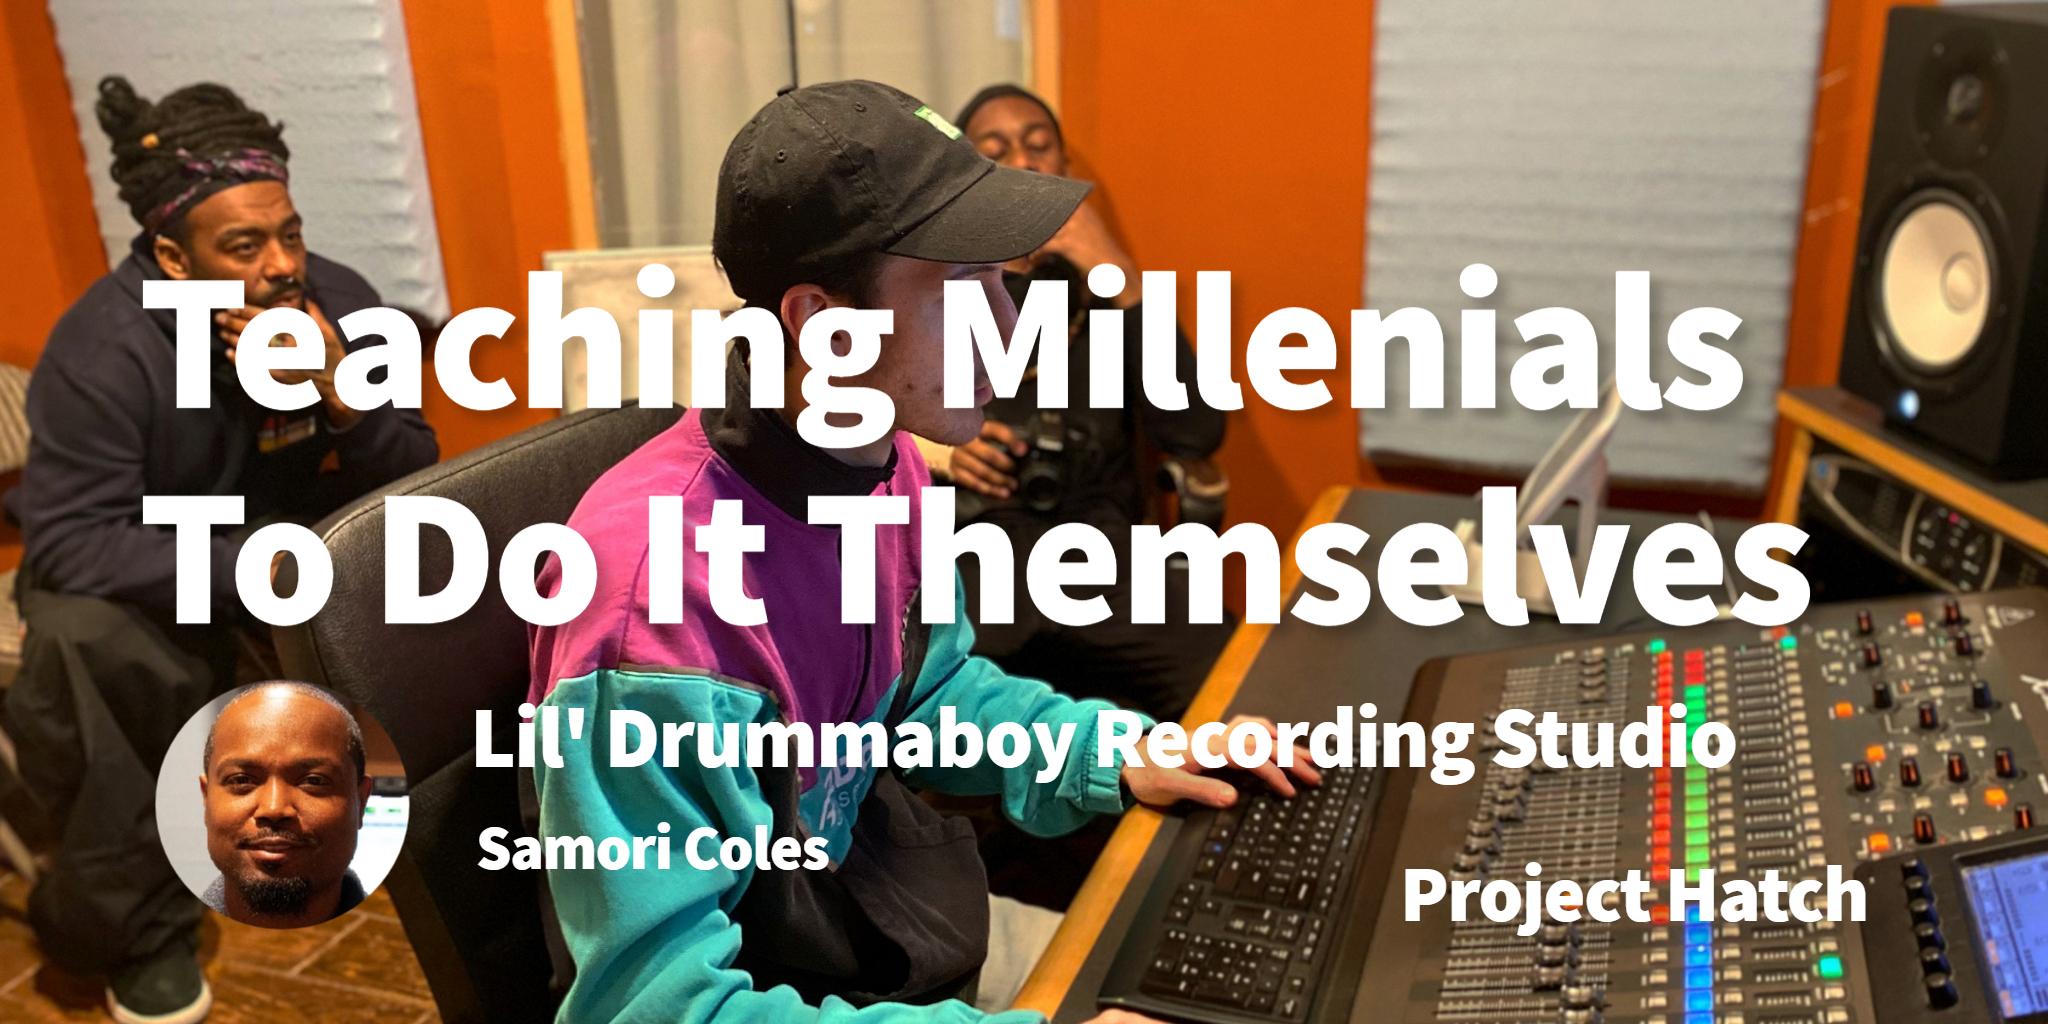 Lil' Drummaboy Recording Studio Samori Coles